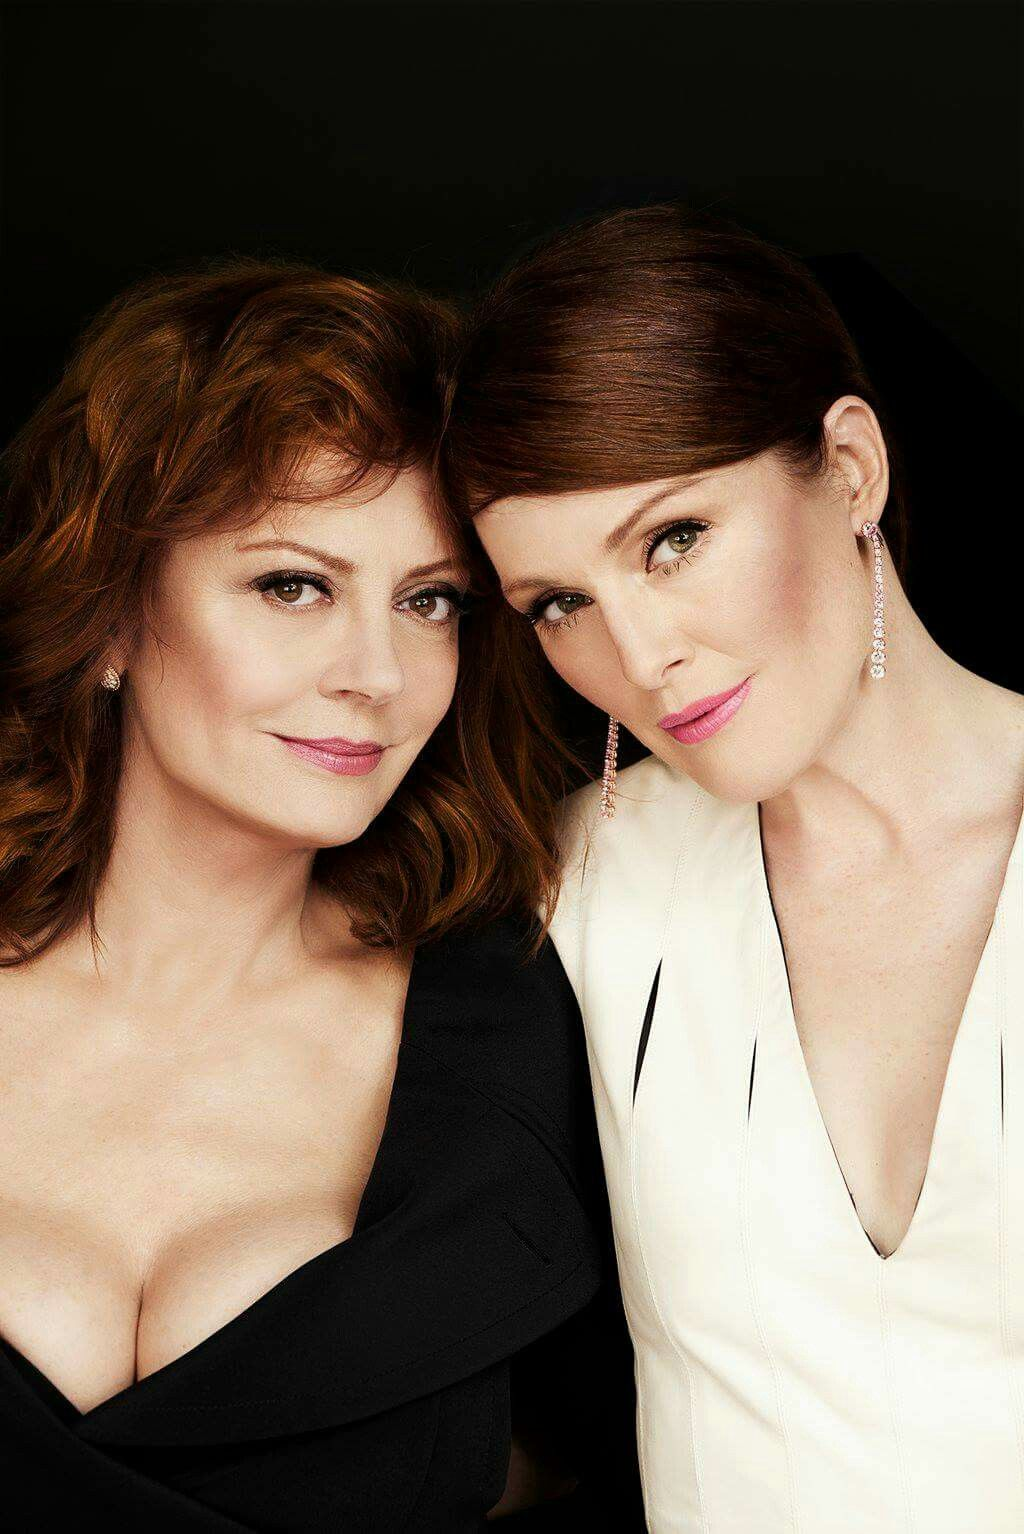 susan sarandon & julianne moore   beautiful women   pinterest